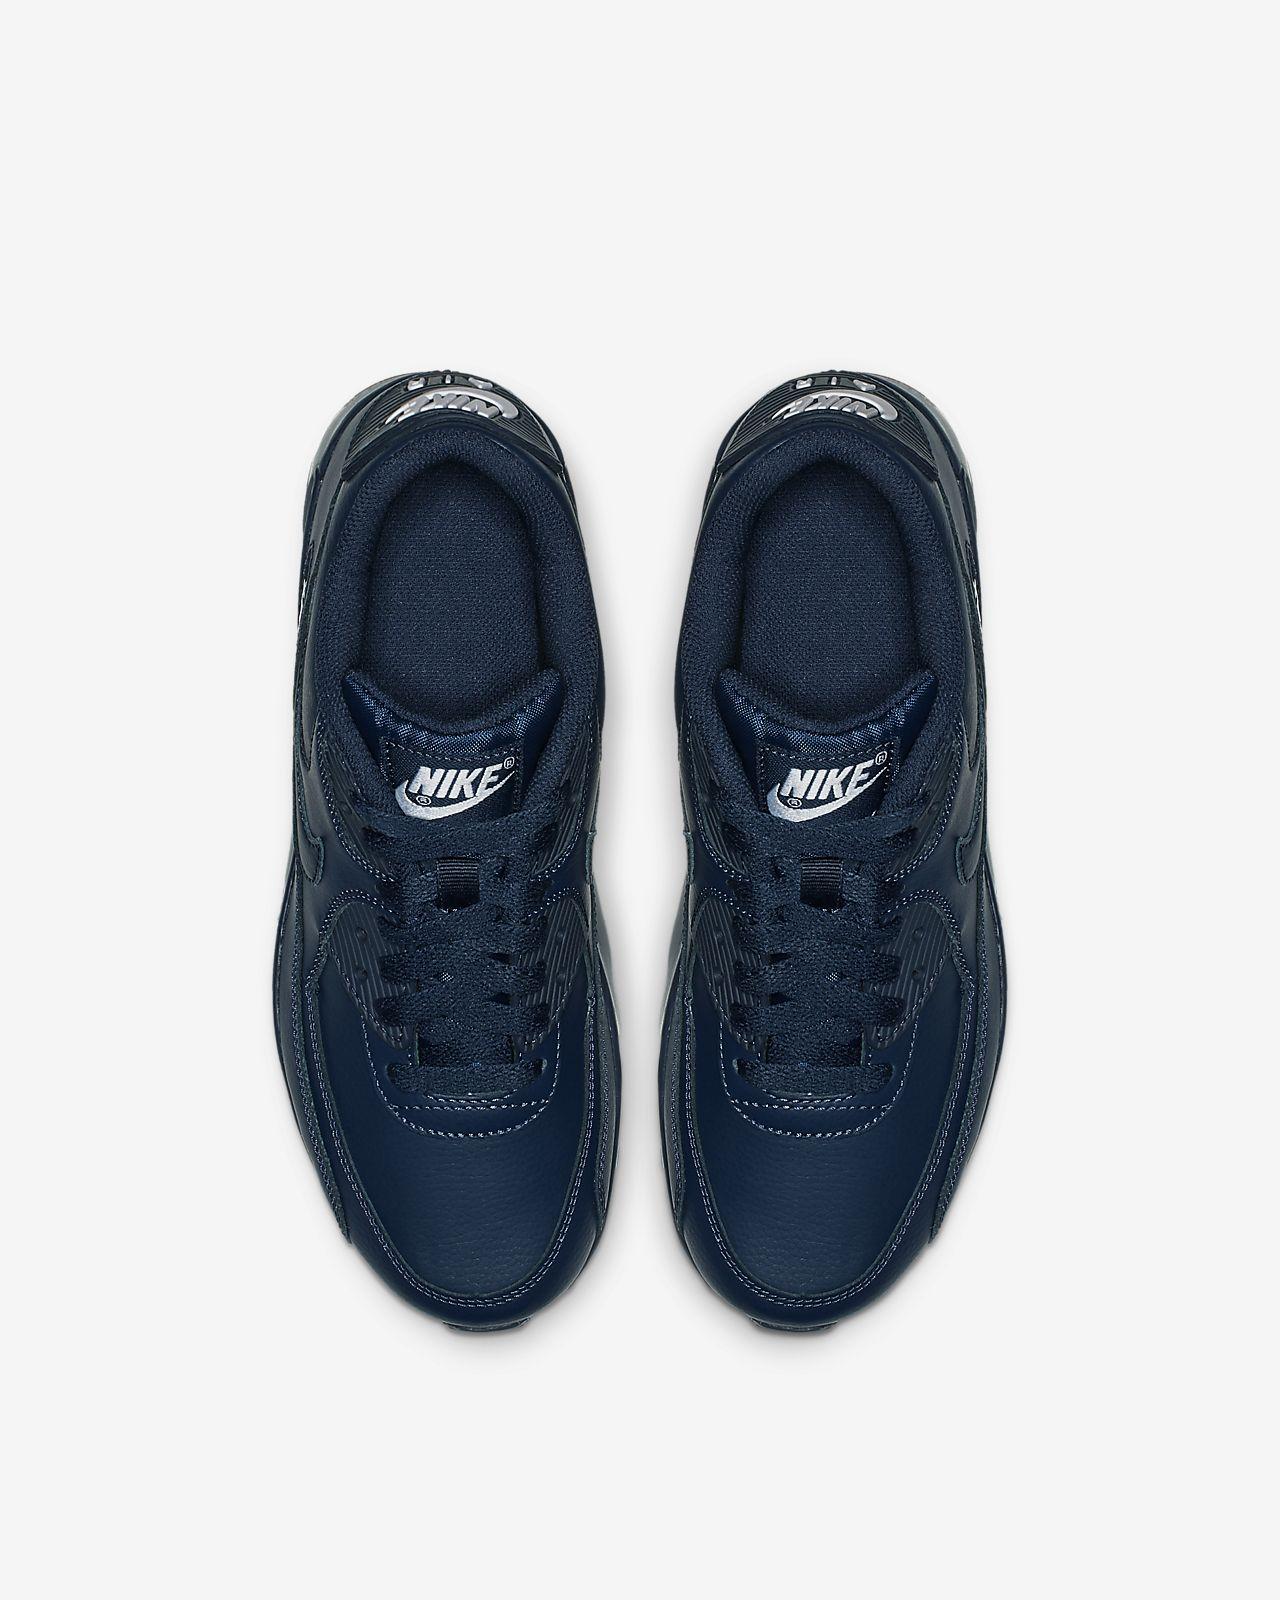 0b99a7196e Nike Air Max 90 Leather Older Kids' Shoe. Nike.com GB